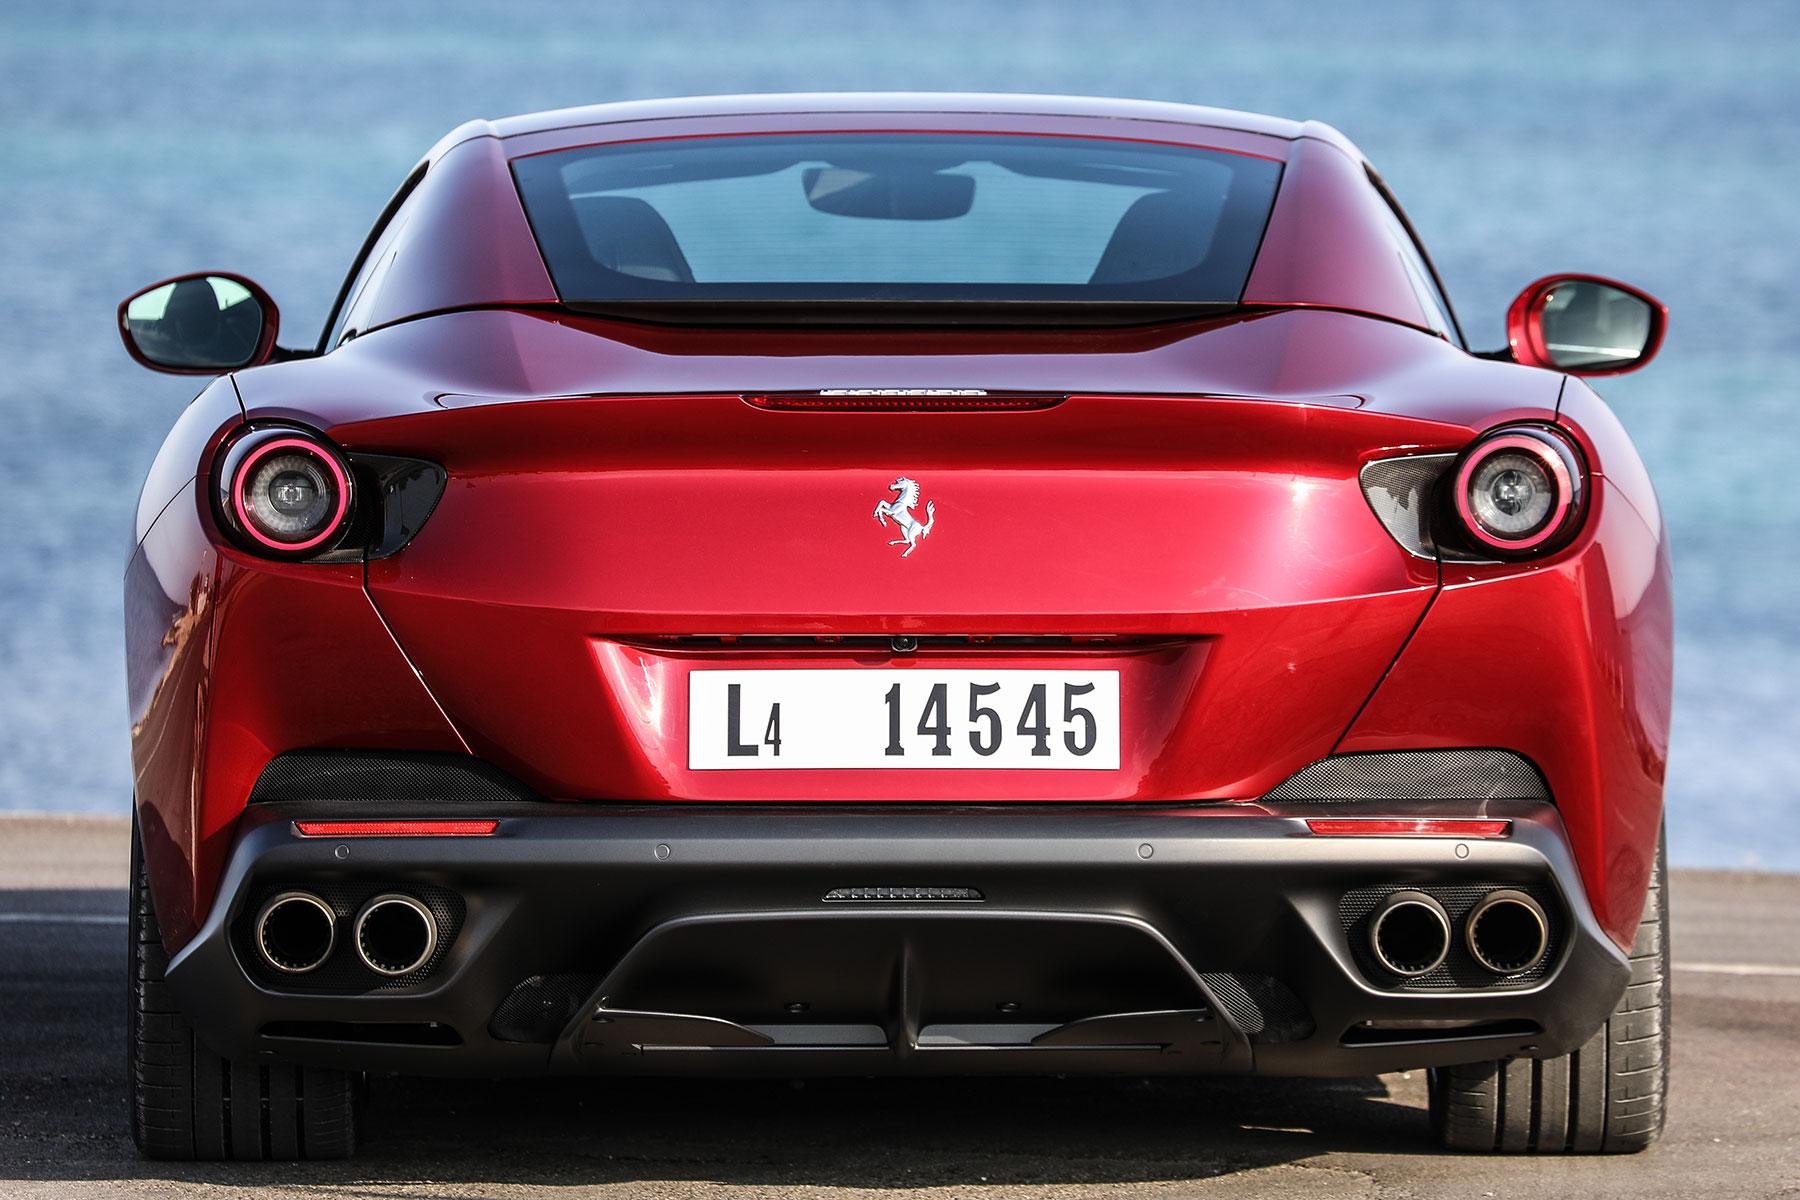 Mazda 2018 Pick Up >> 2018 Ferrari Portofino first drive: the entry-level Ferrari you STILL can't afford